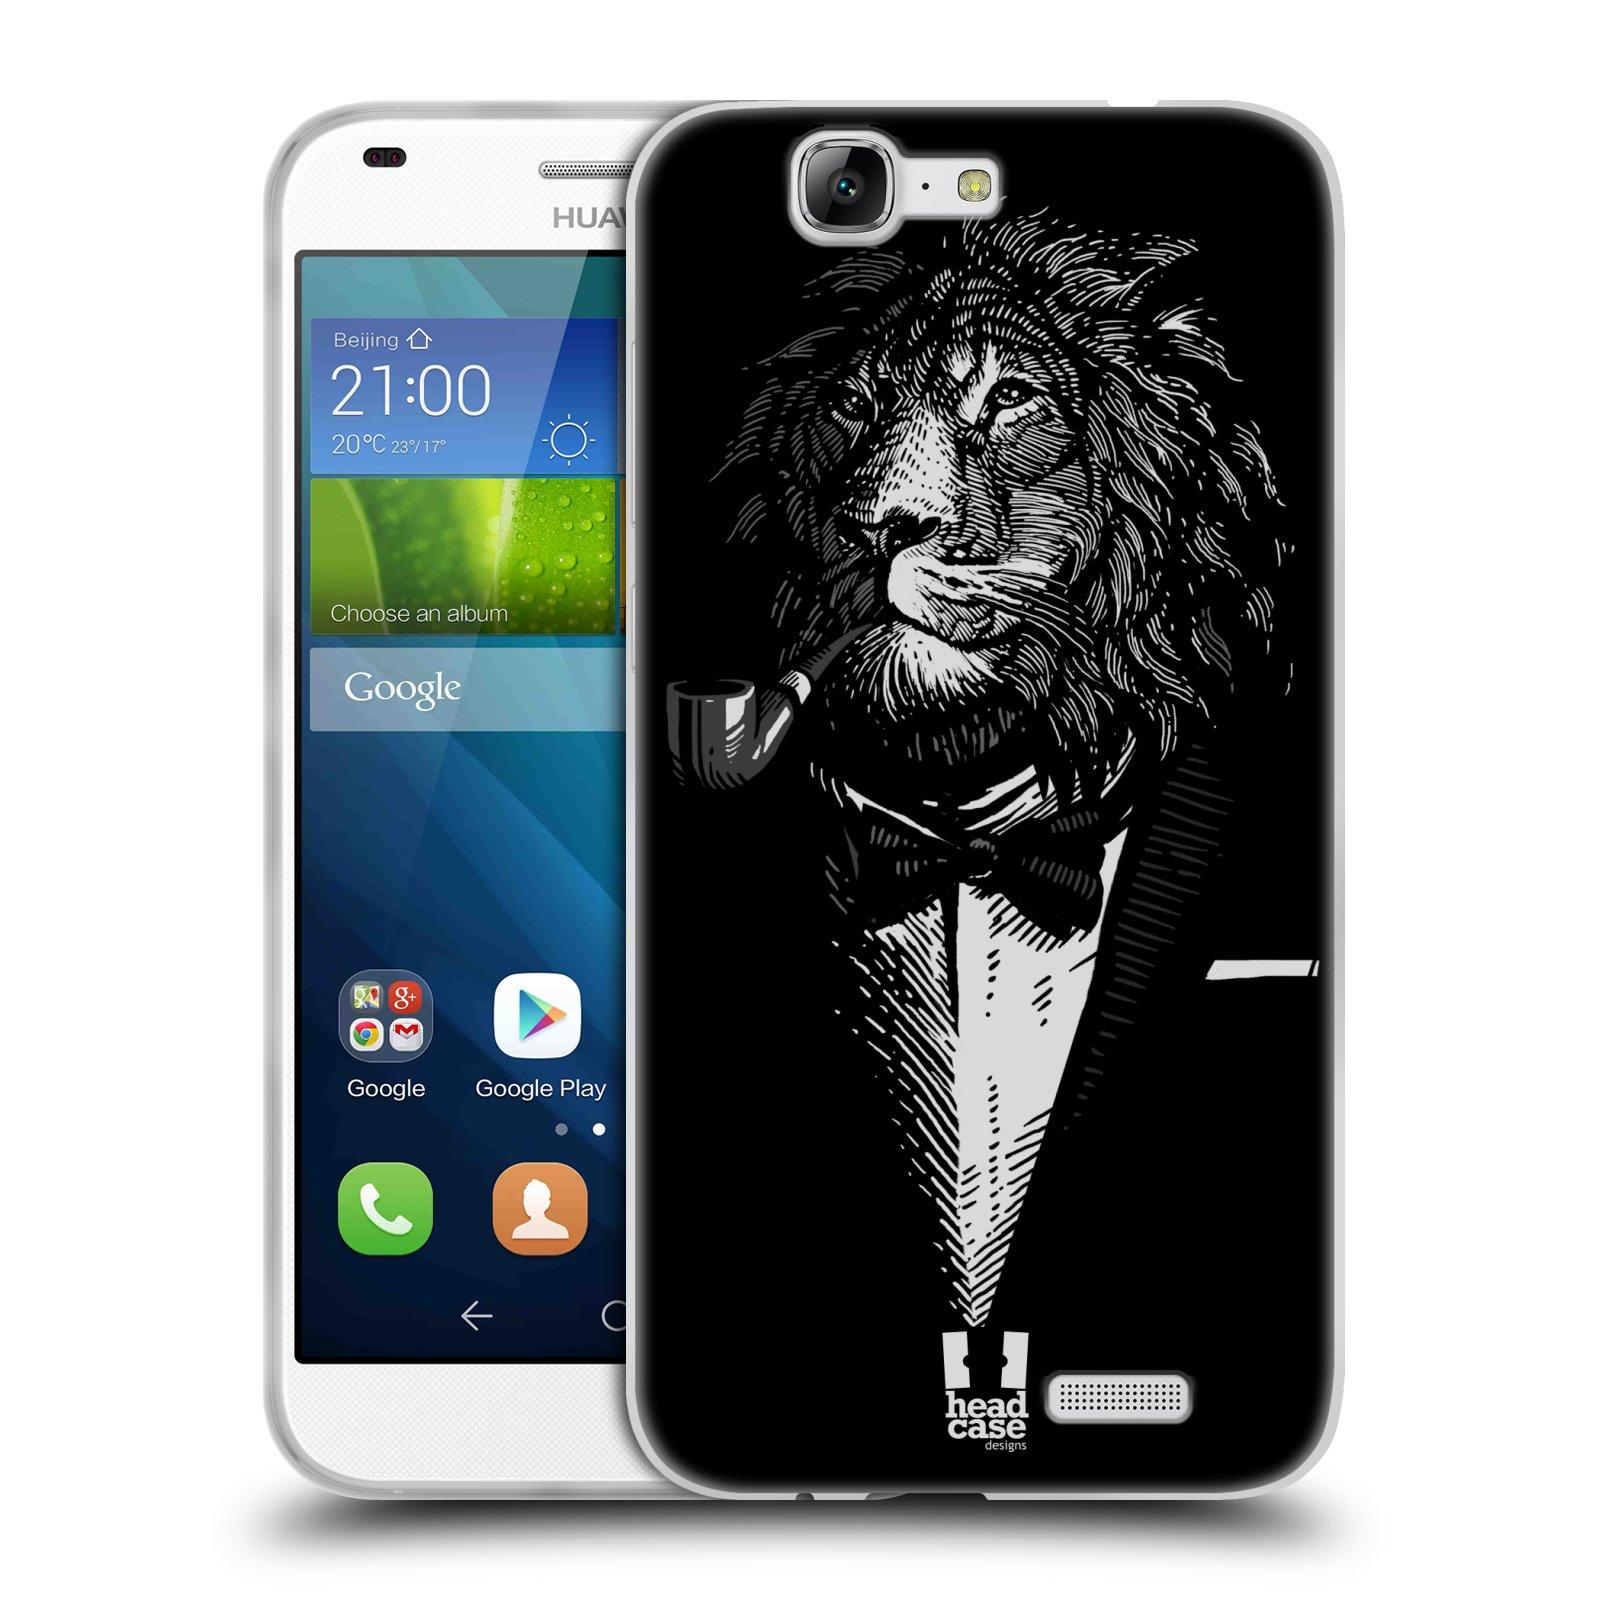 Silikonové pouzdro na mobil Huawei Ascend G7 HEAD CASE LEV V KVÁDRU (Silikonový kryt či obal na mobilní telefon Huawei Ascend G7)